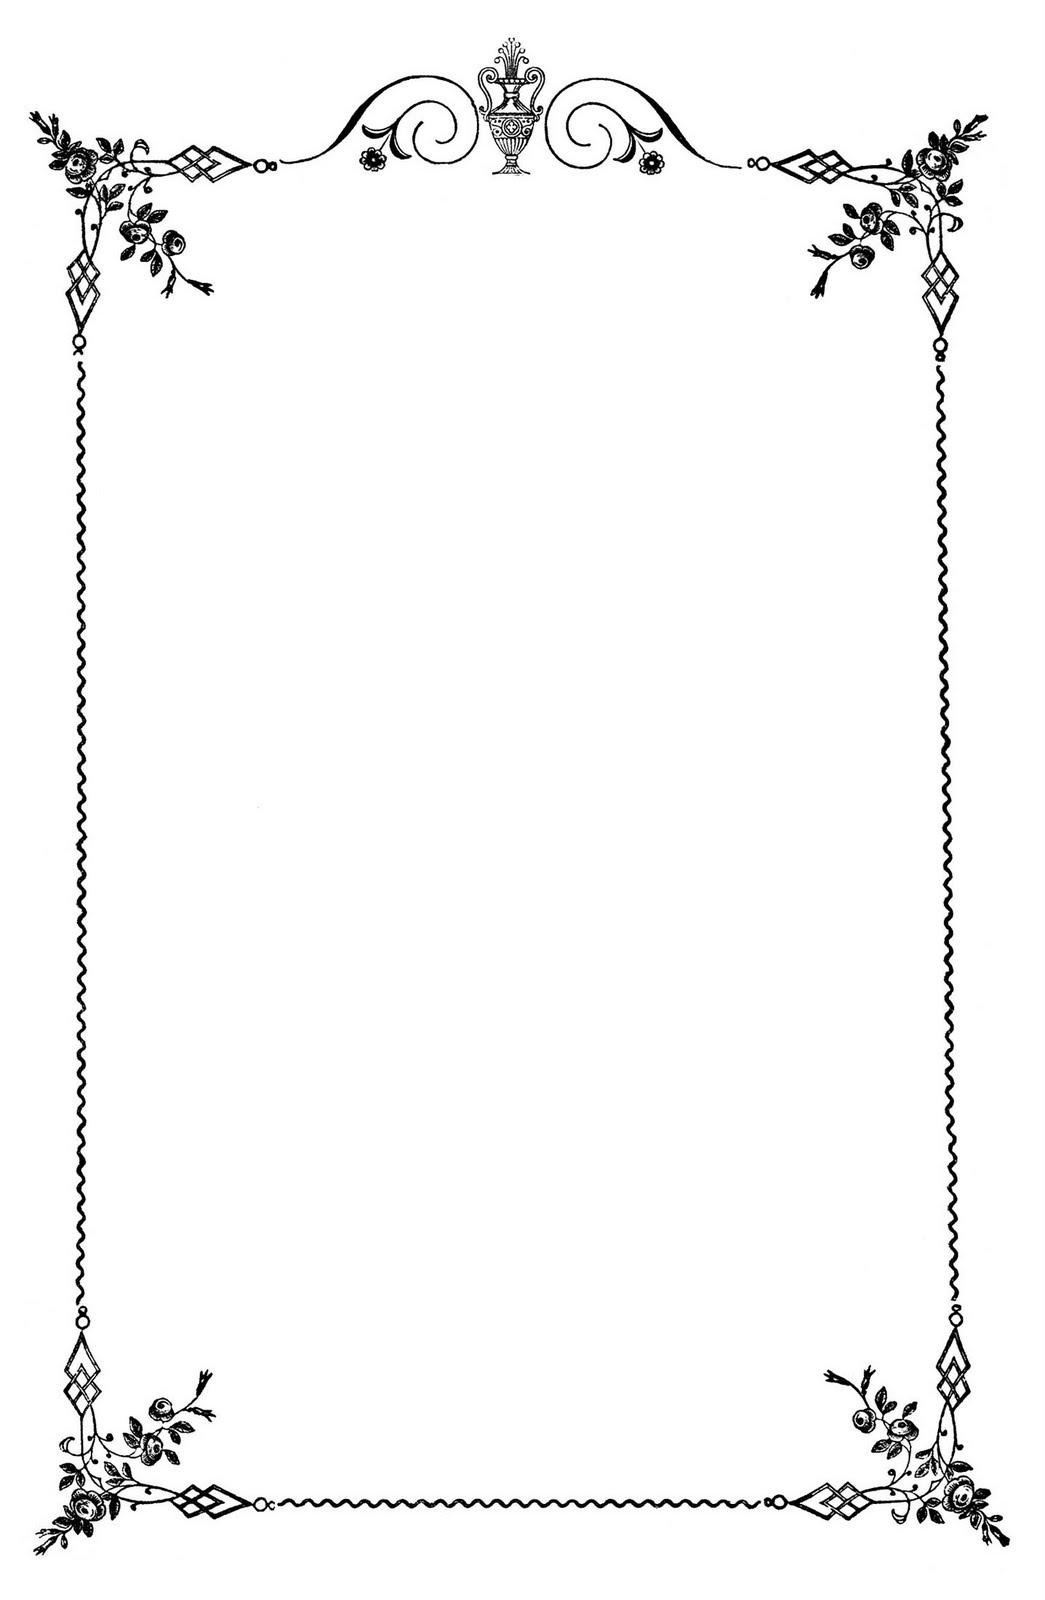 Wedding menu clipart free transparent library Free Menus Cliparts, Download Free Clip Art, Free Clip Art ... transparent library